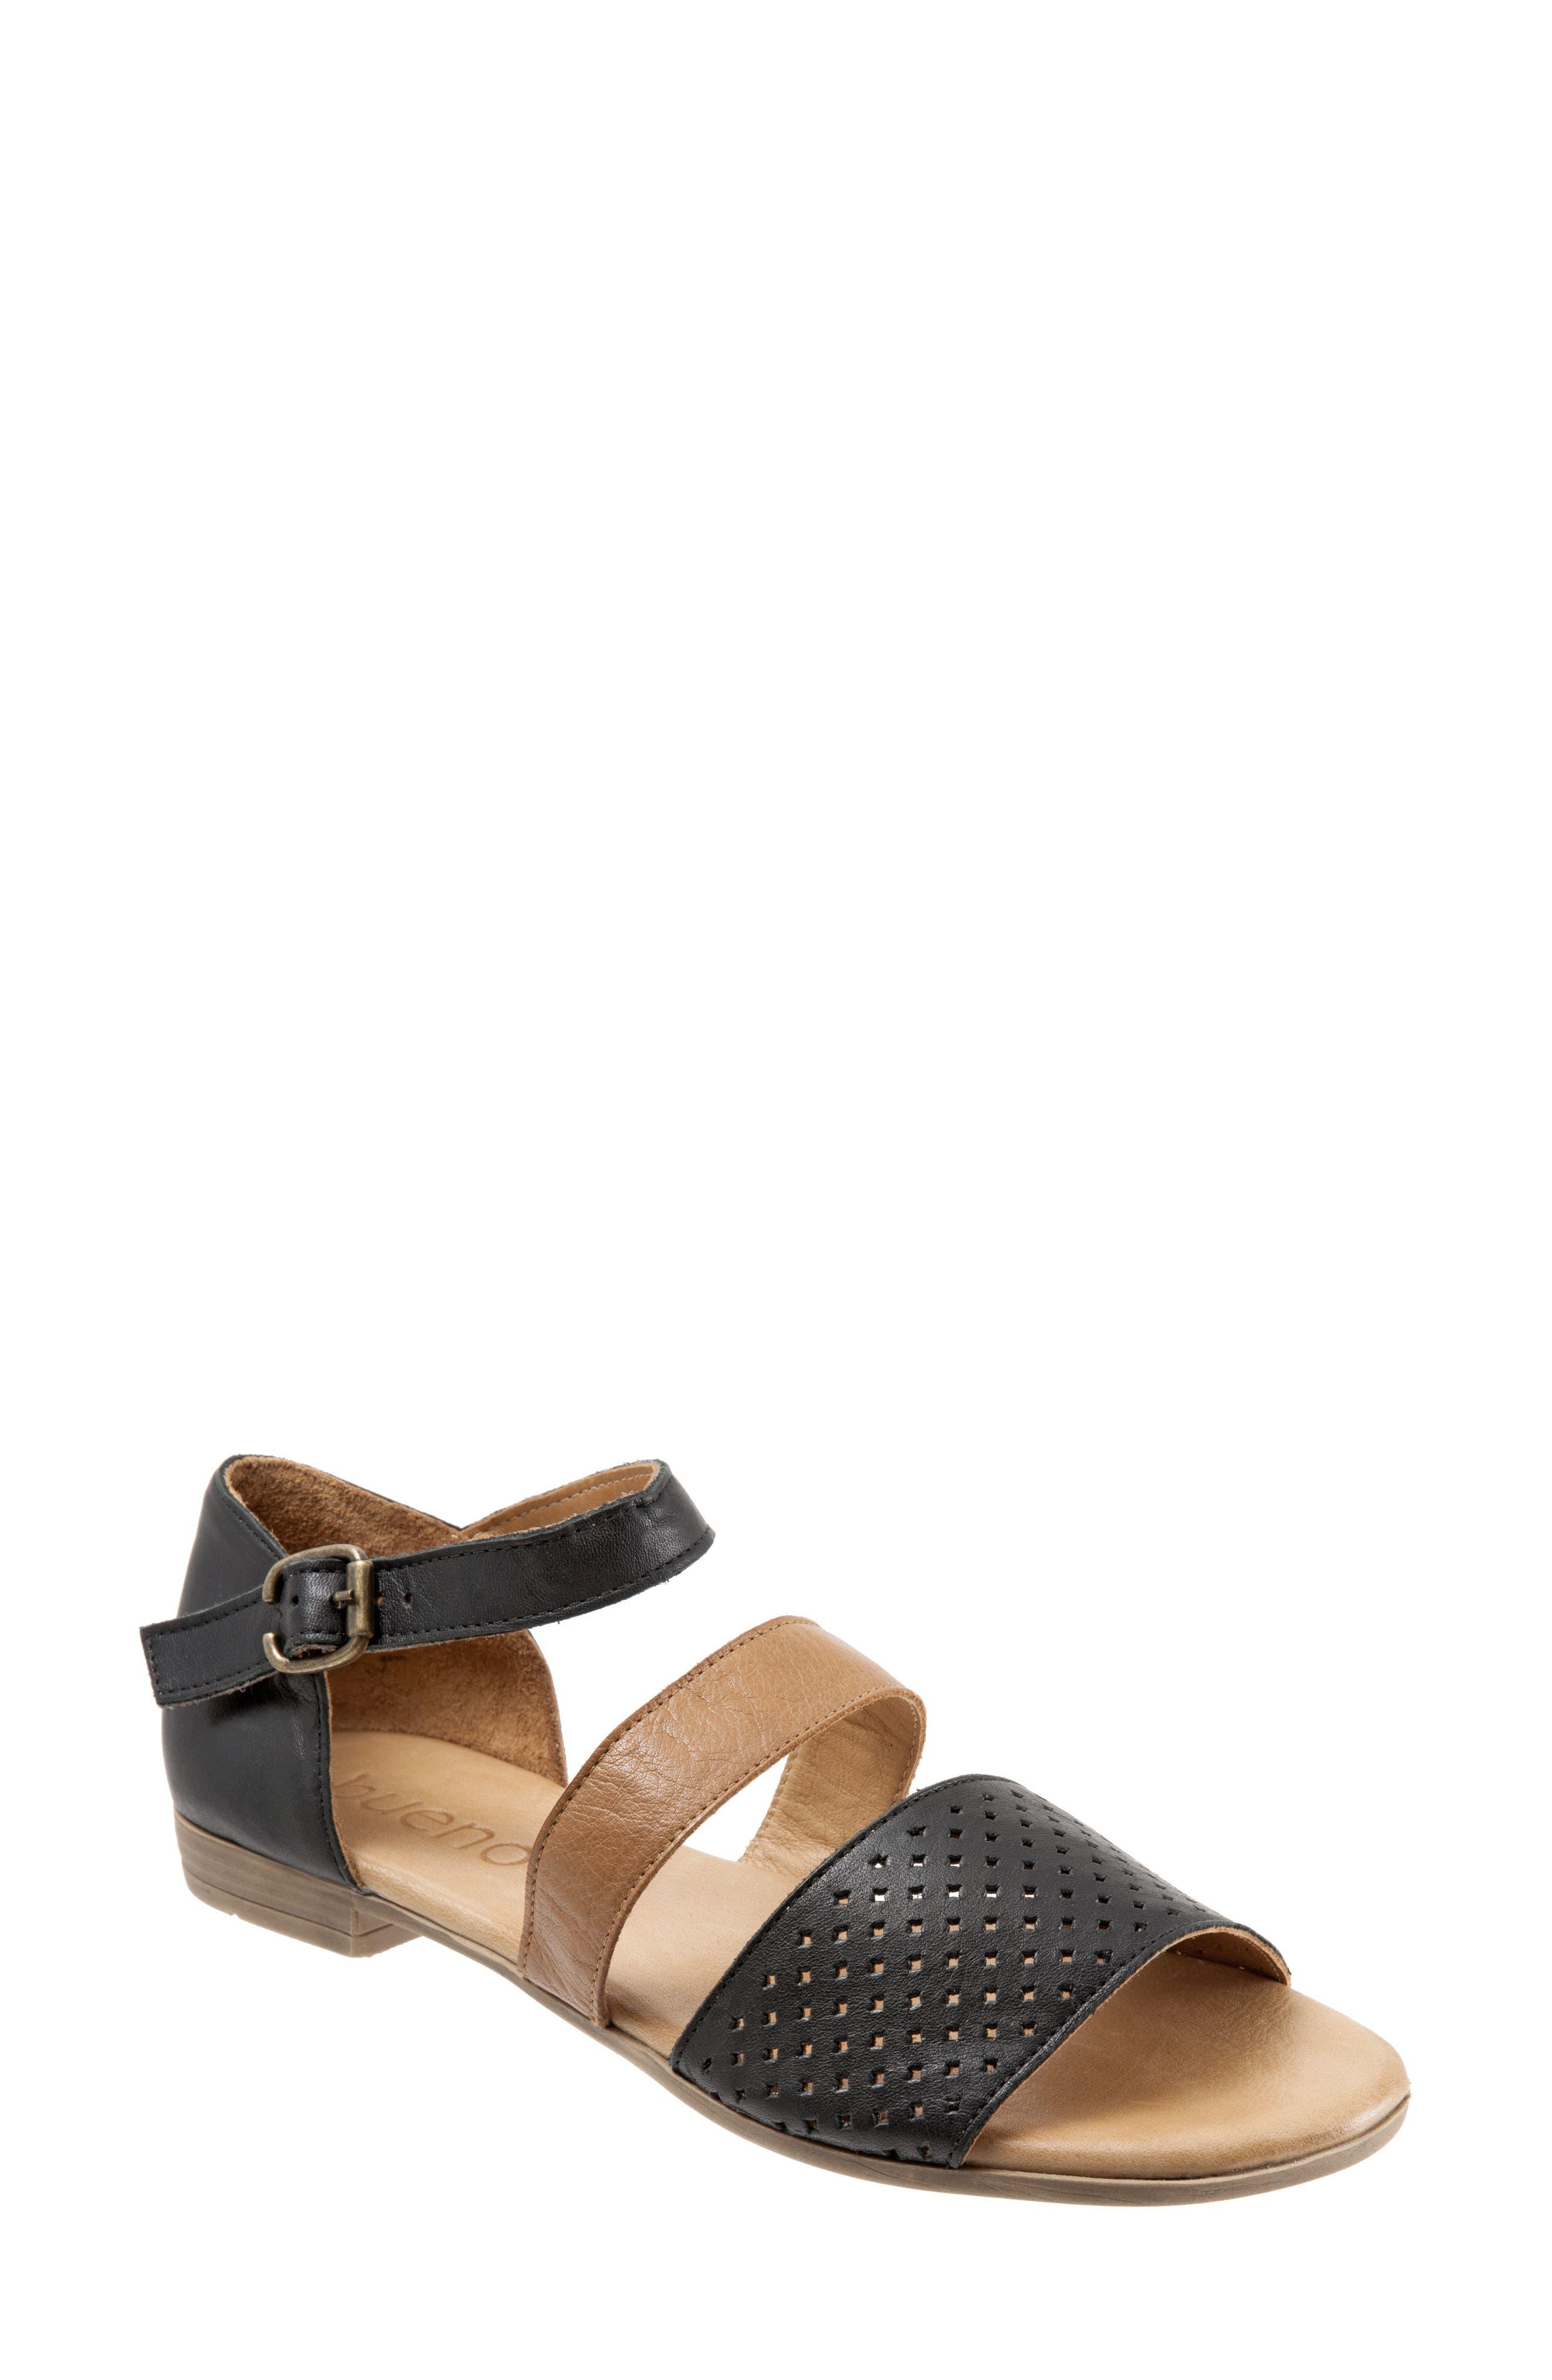 Bueno Janet Perforated Flat Sandal - Black